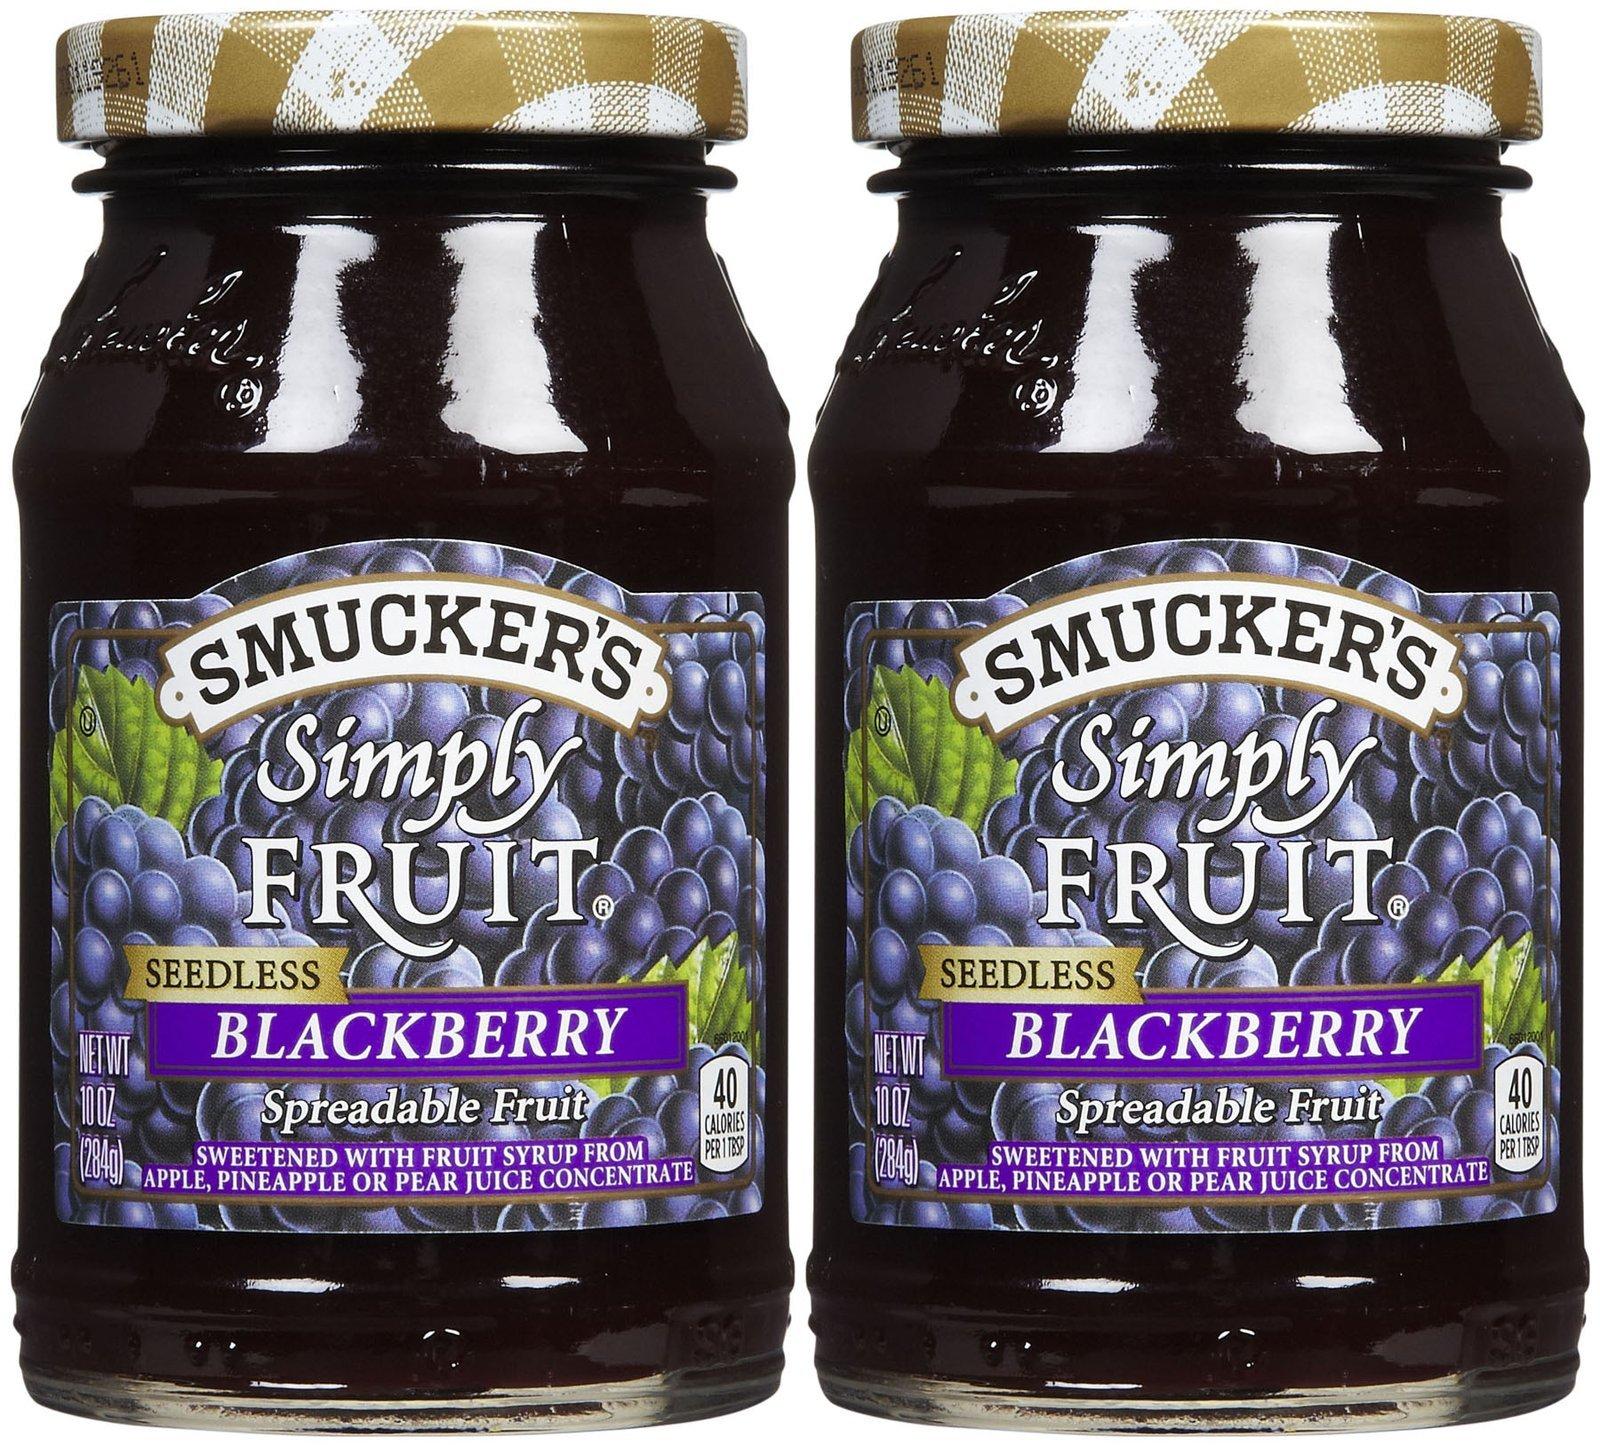 Smucker's Simply Fruit Seedless Blackberry Spread, 10 oz, 2 pk